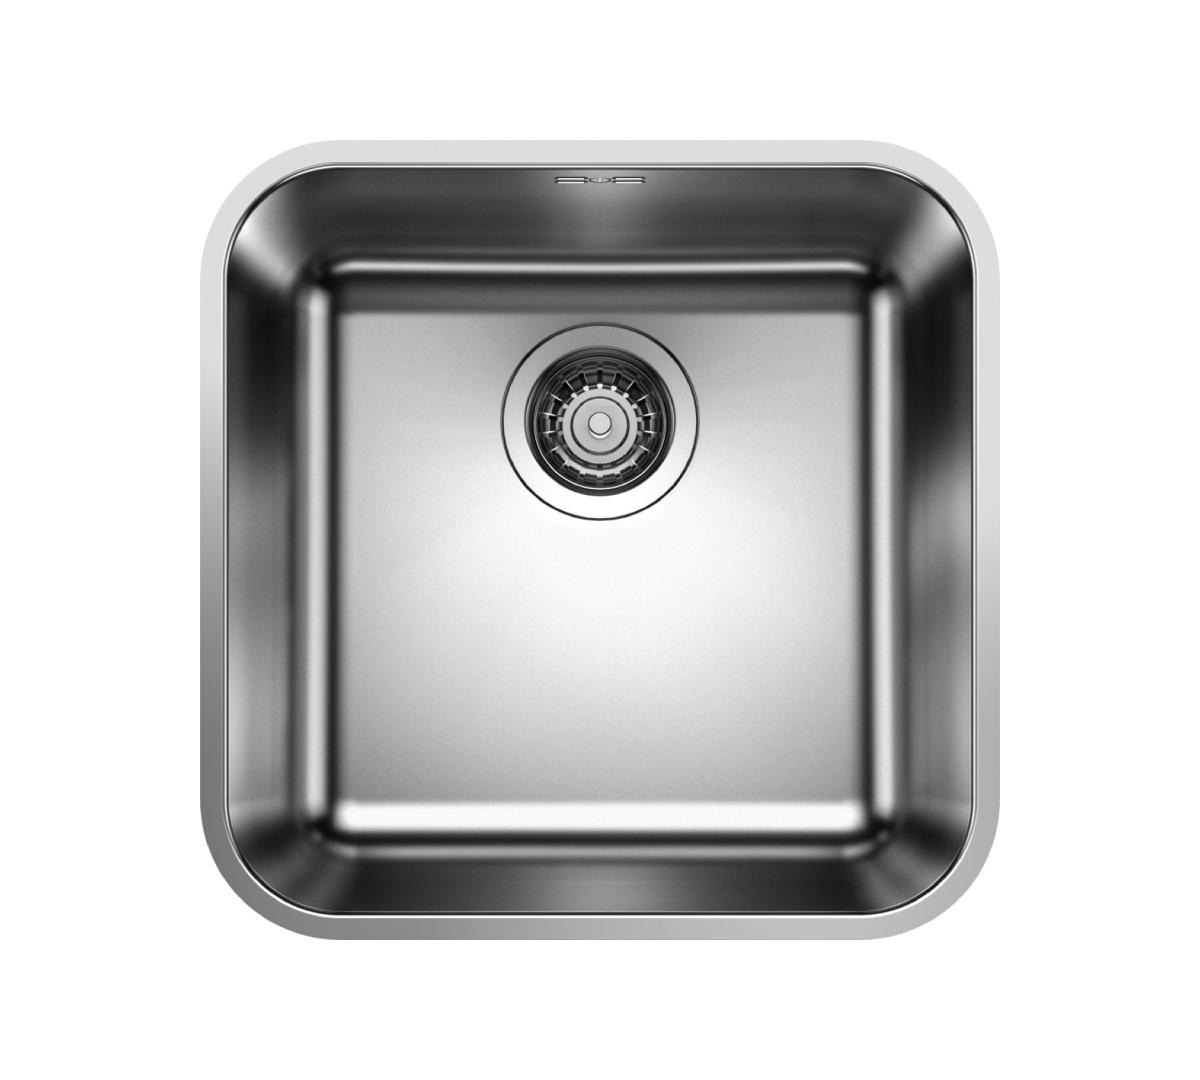 Supra 400-U Undermount Bowl Sink With Crest Tap Stainless Steel